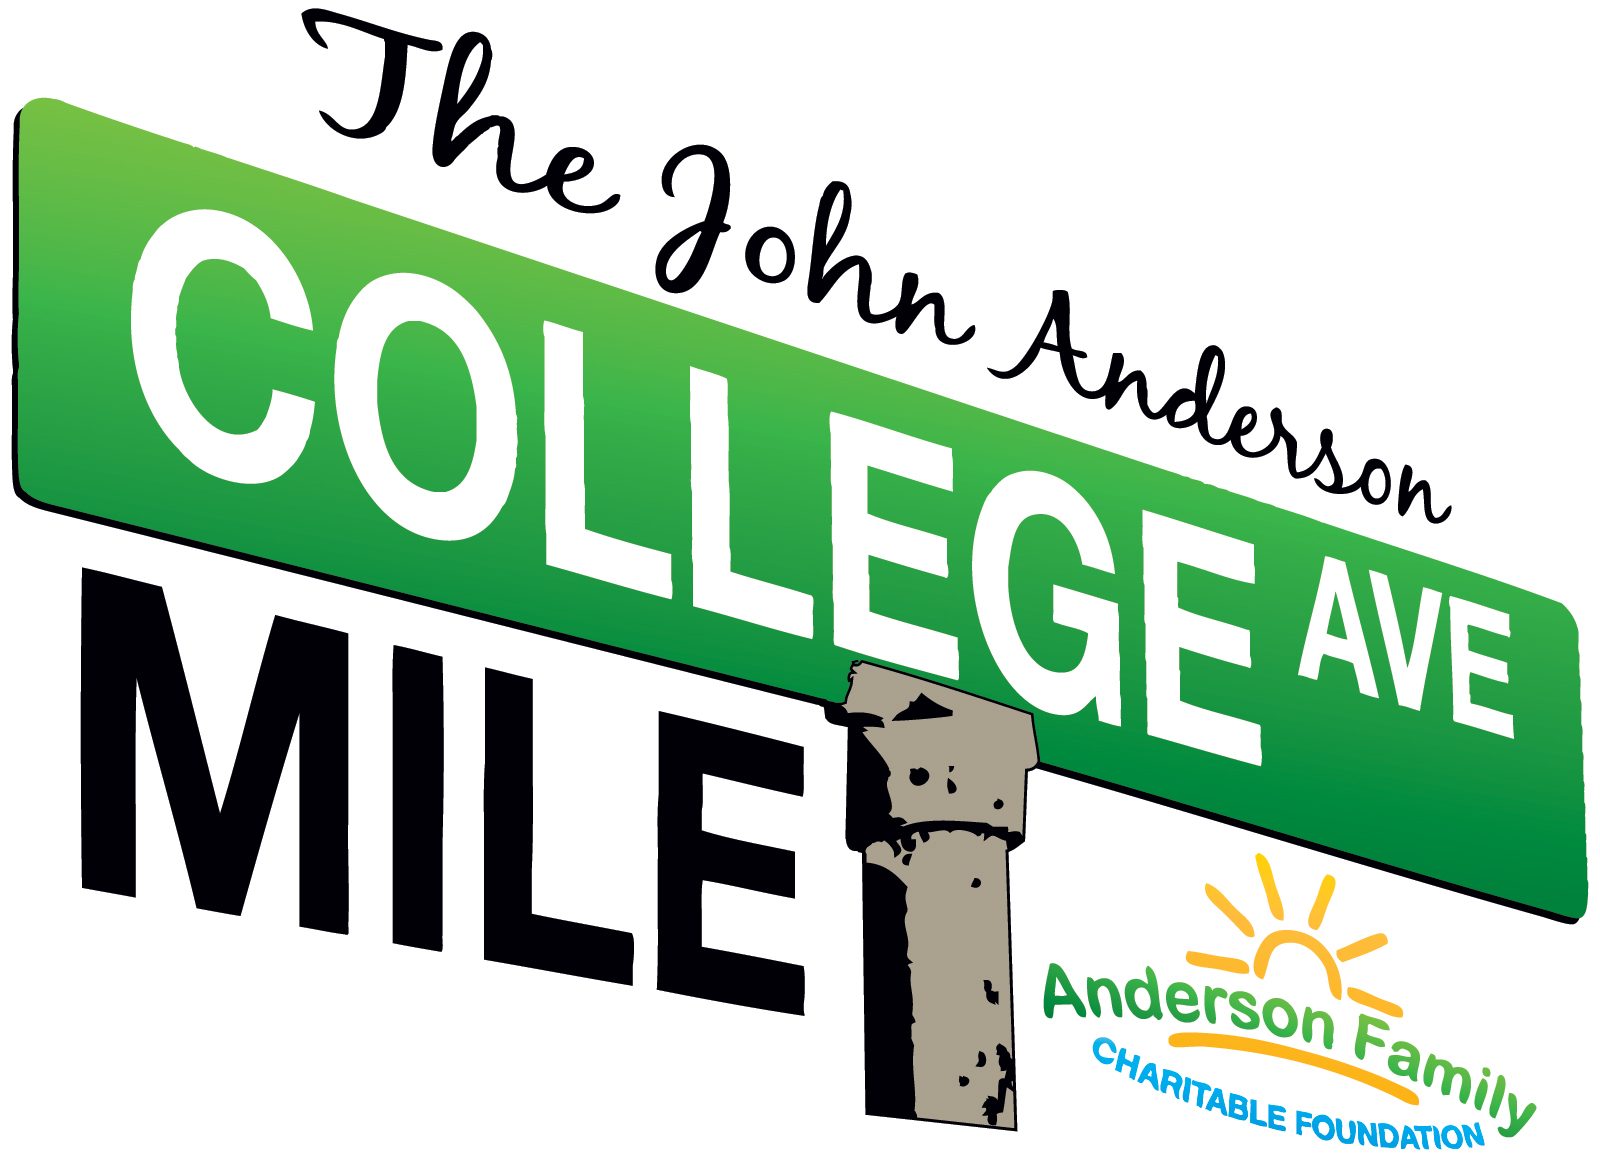 KTGR_2014_CollegeAve_Logo